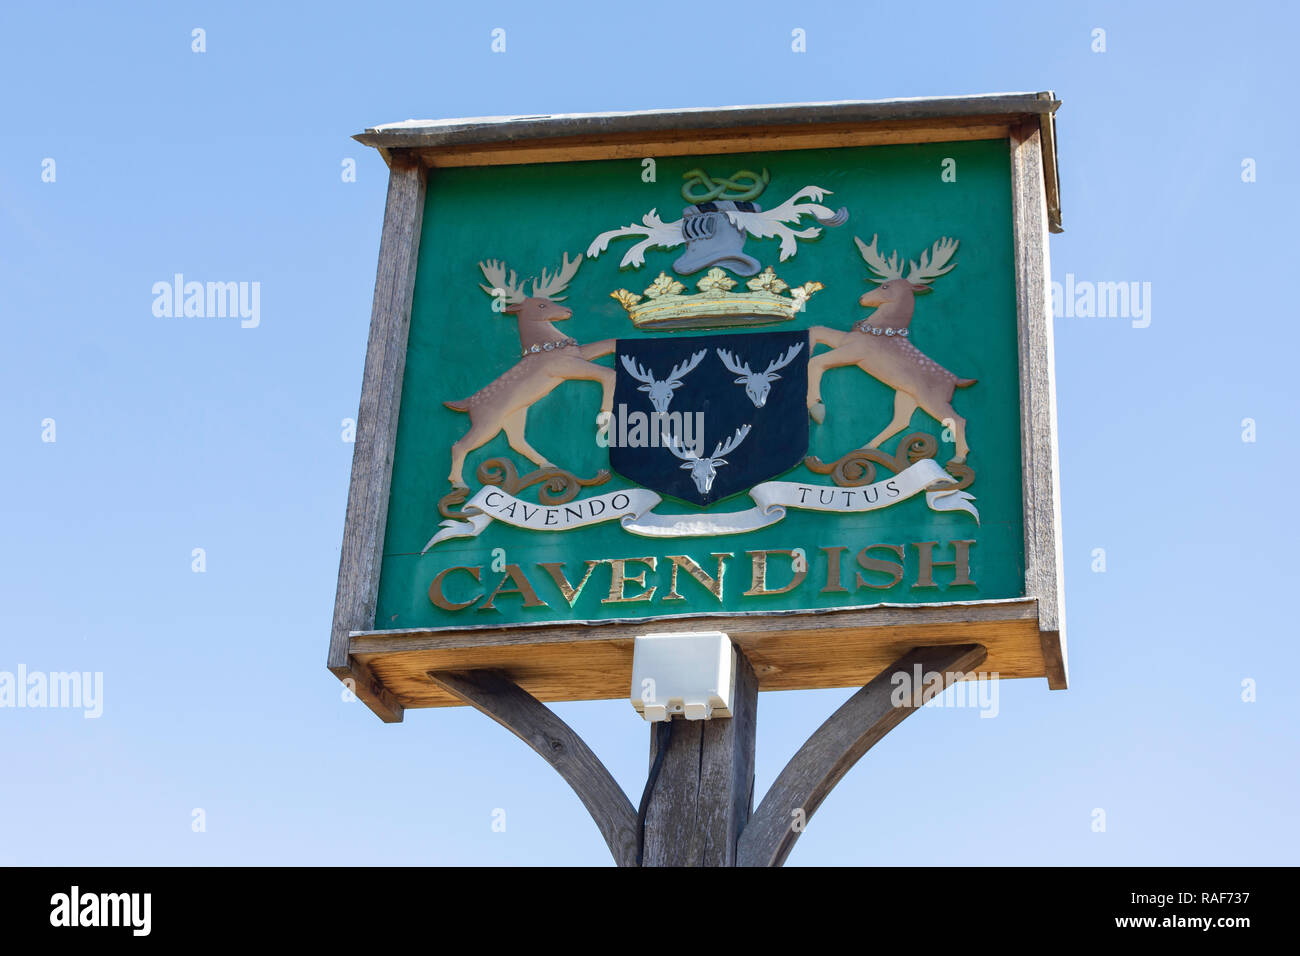 Village sign, The Green, Cavendish, Suffolk, England, United Kingdom - Stock Image